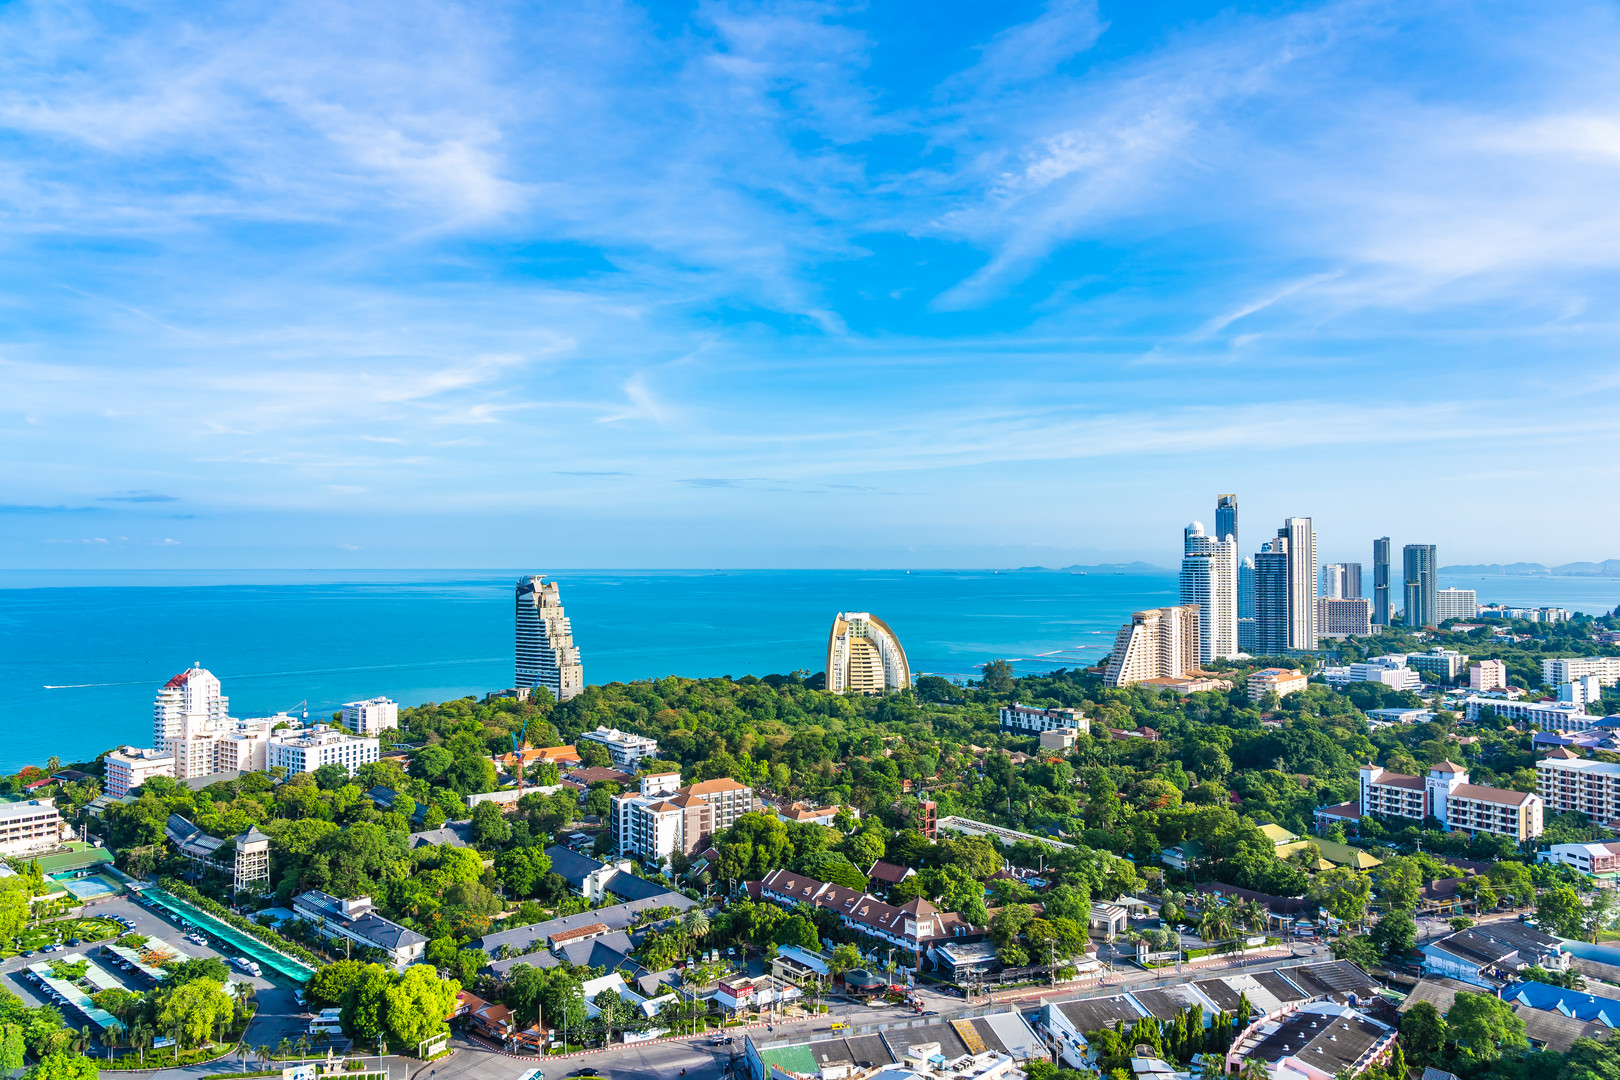 pattaya-chonburi-thailand-28-may-2019-be